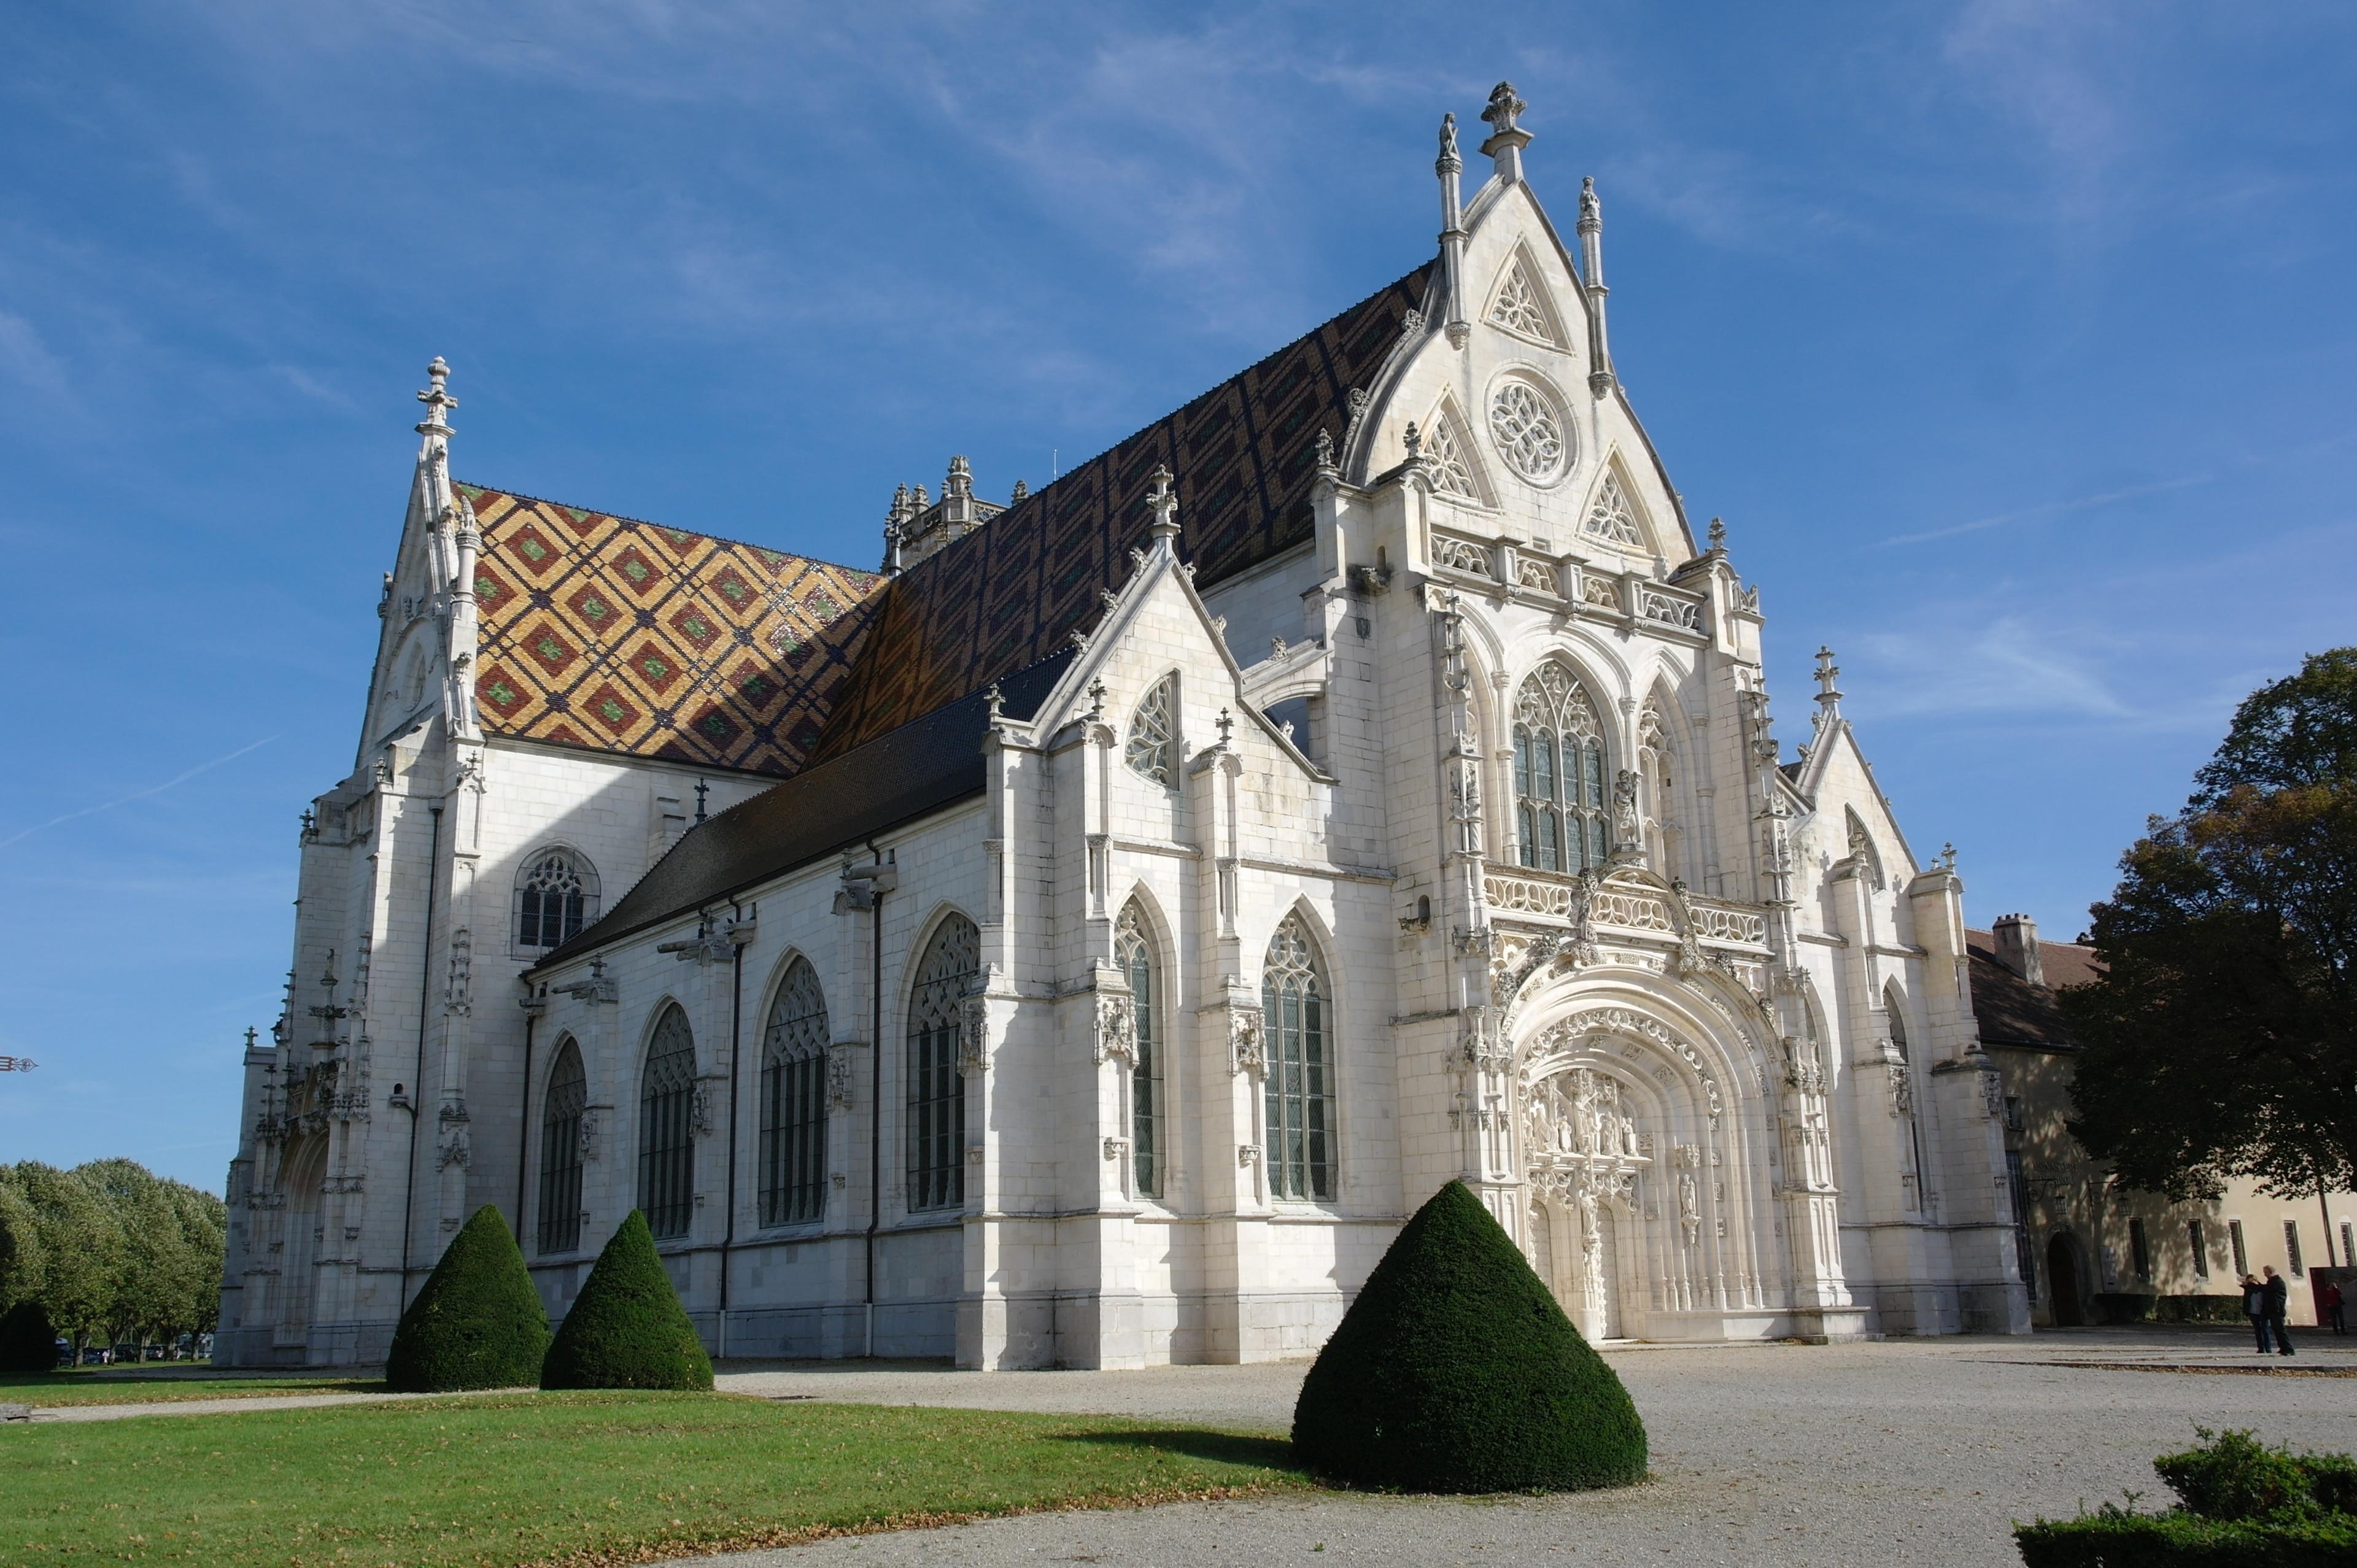 Bourg-en-Bresse, Ain, France